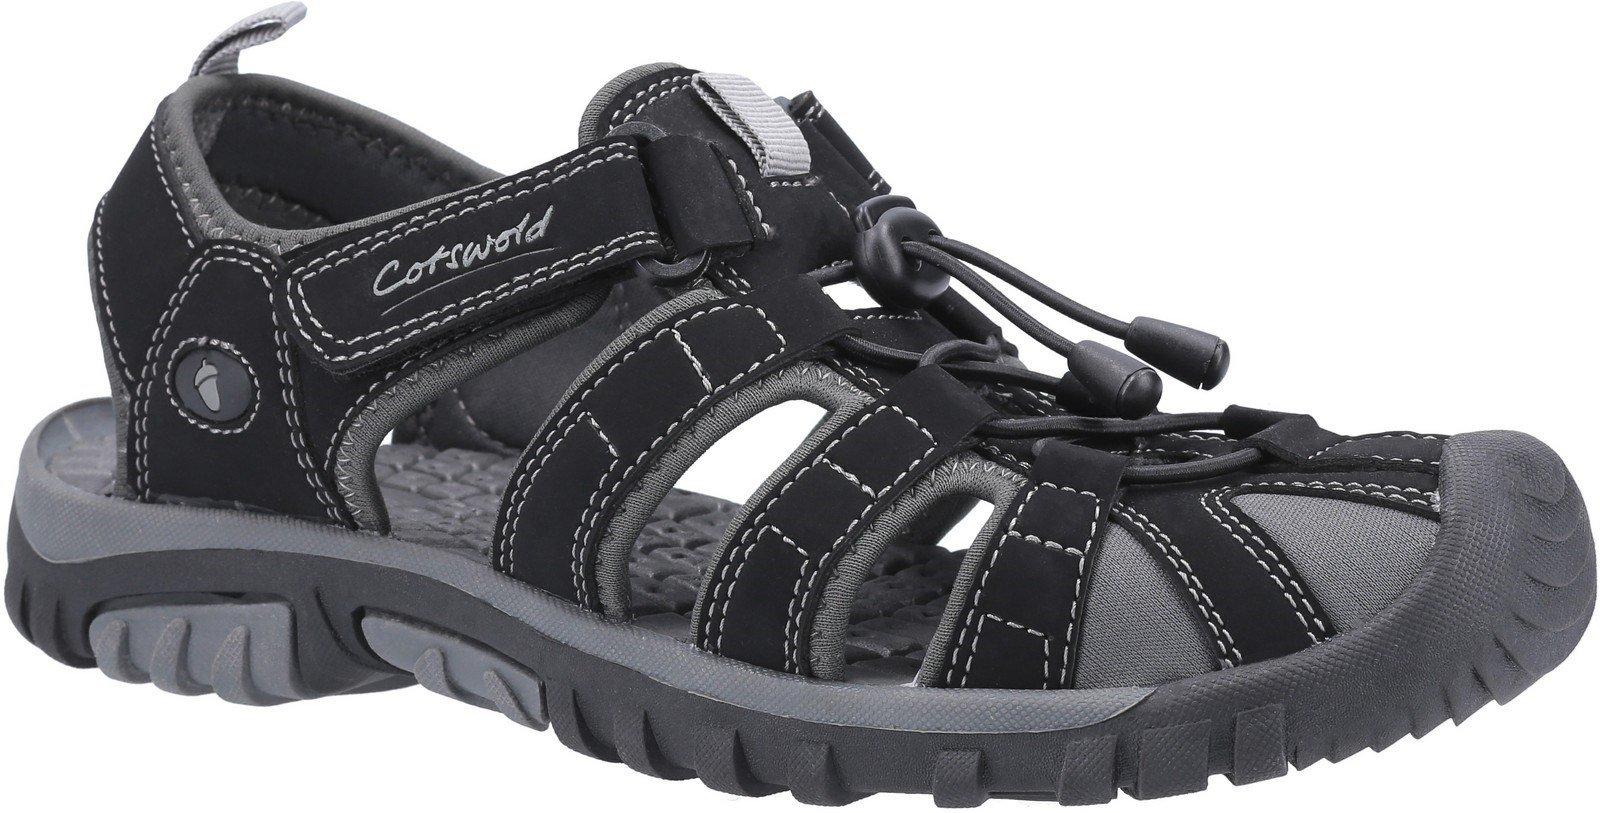 Cotswold Men's Sandhurst Touch Fastening Sandal Various Colours 30160 - Black/Grey 7